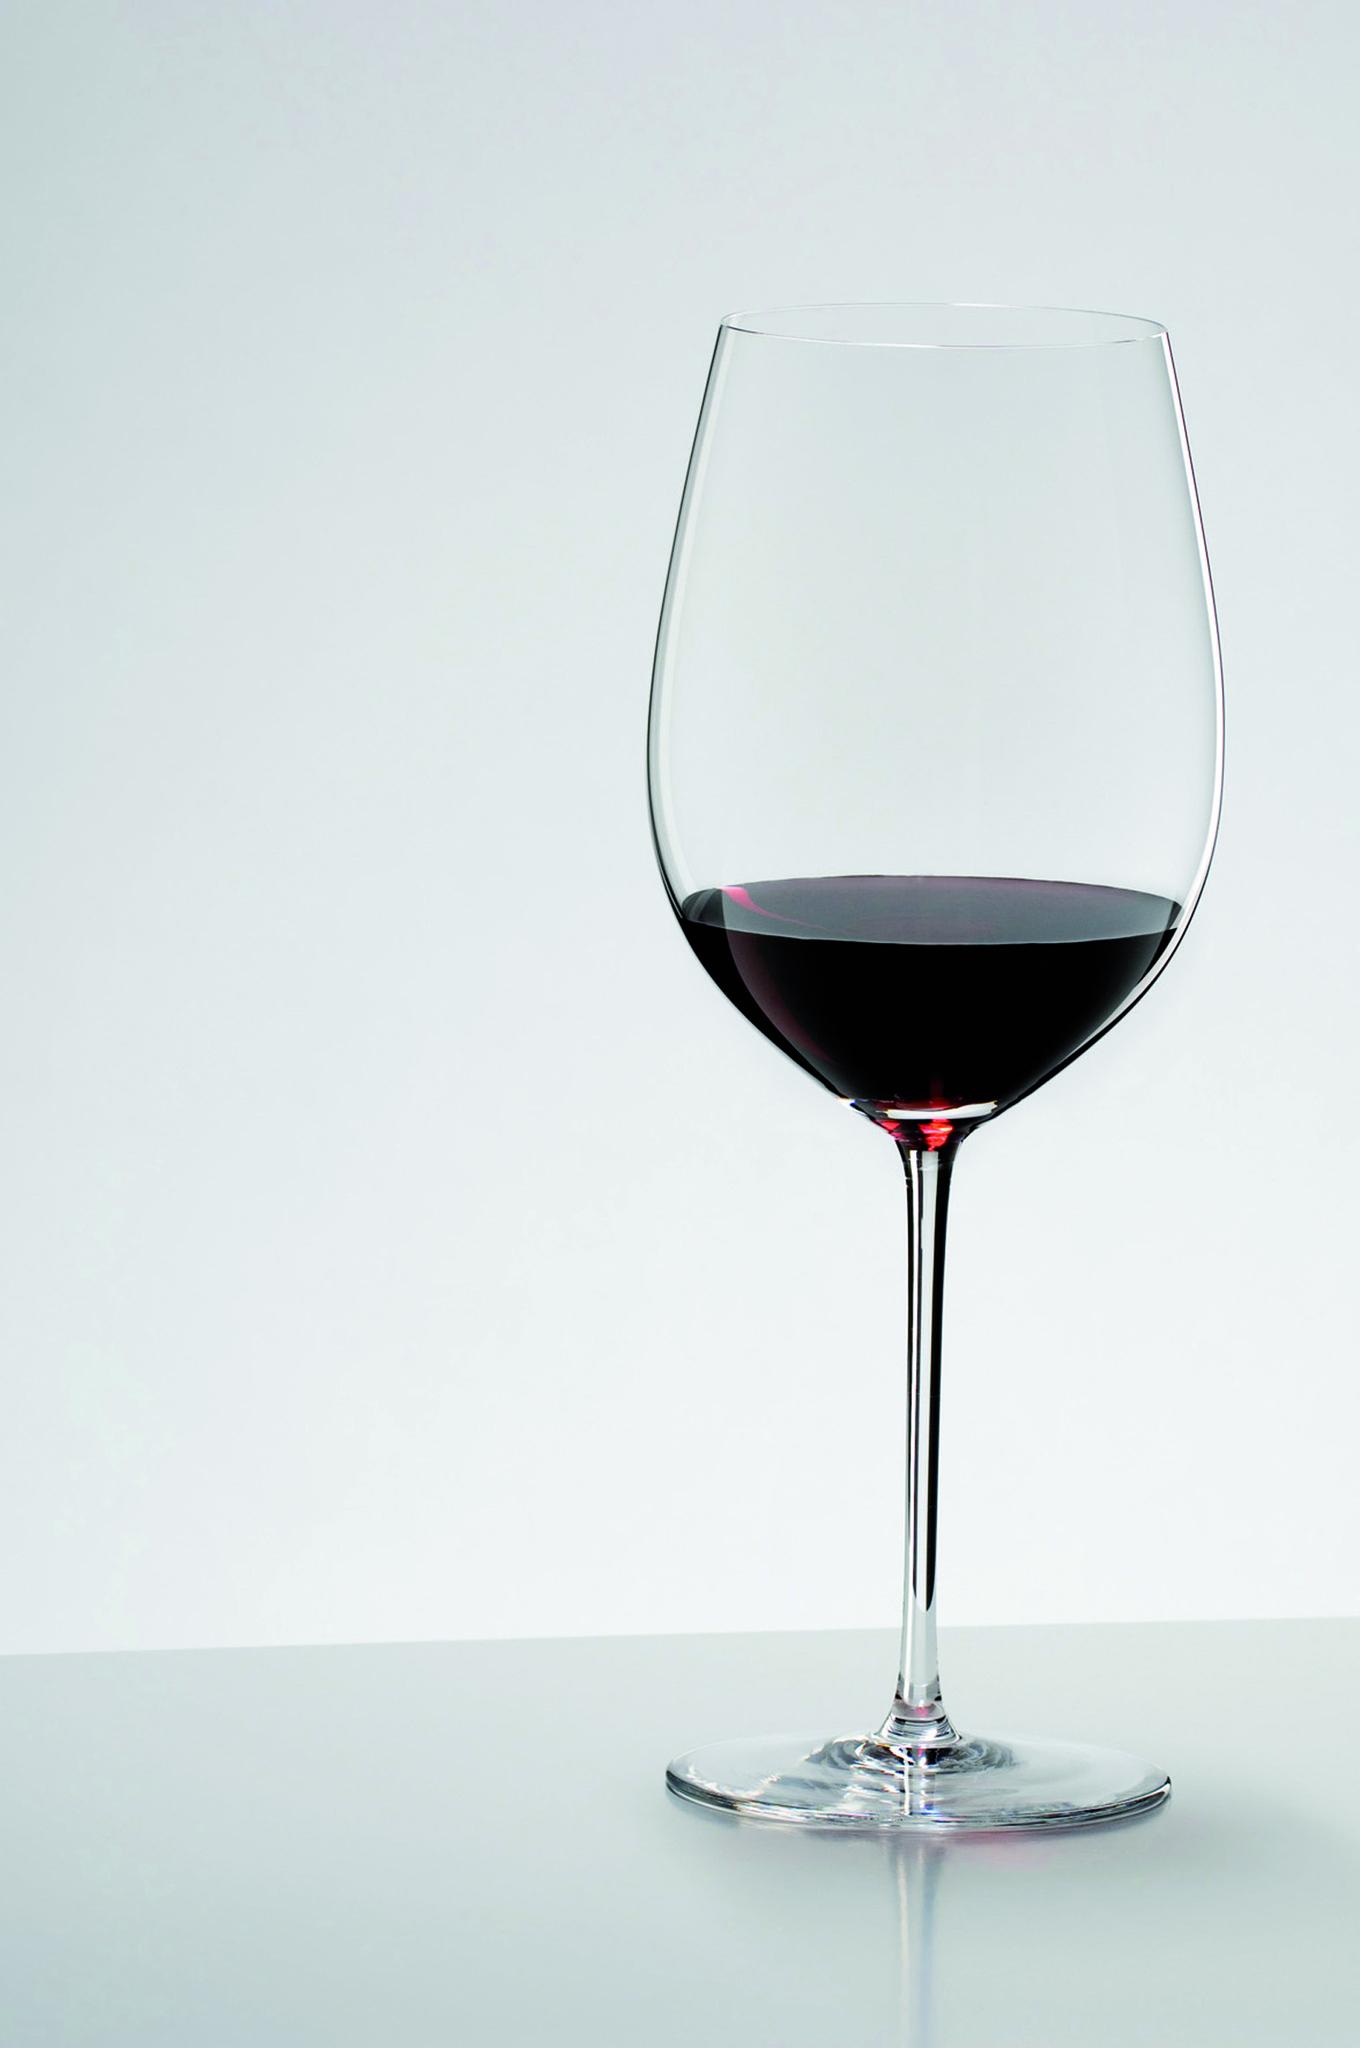 Бокалы Бокал для красного вина 860мл Riedel Sommeliers Bordeaux Grand Cru bokal-dlya-krasnogo-vina-860-ml-riedel-bordeaux-grand-cru-avstriya-foto.jpg